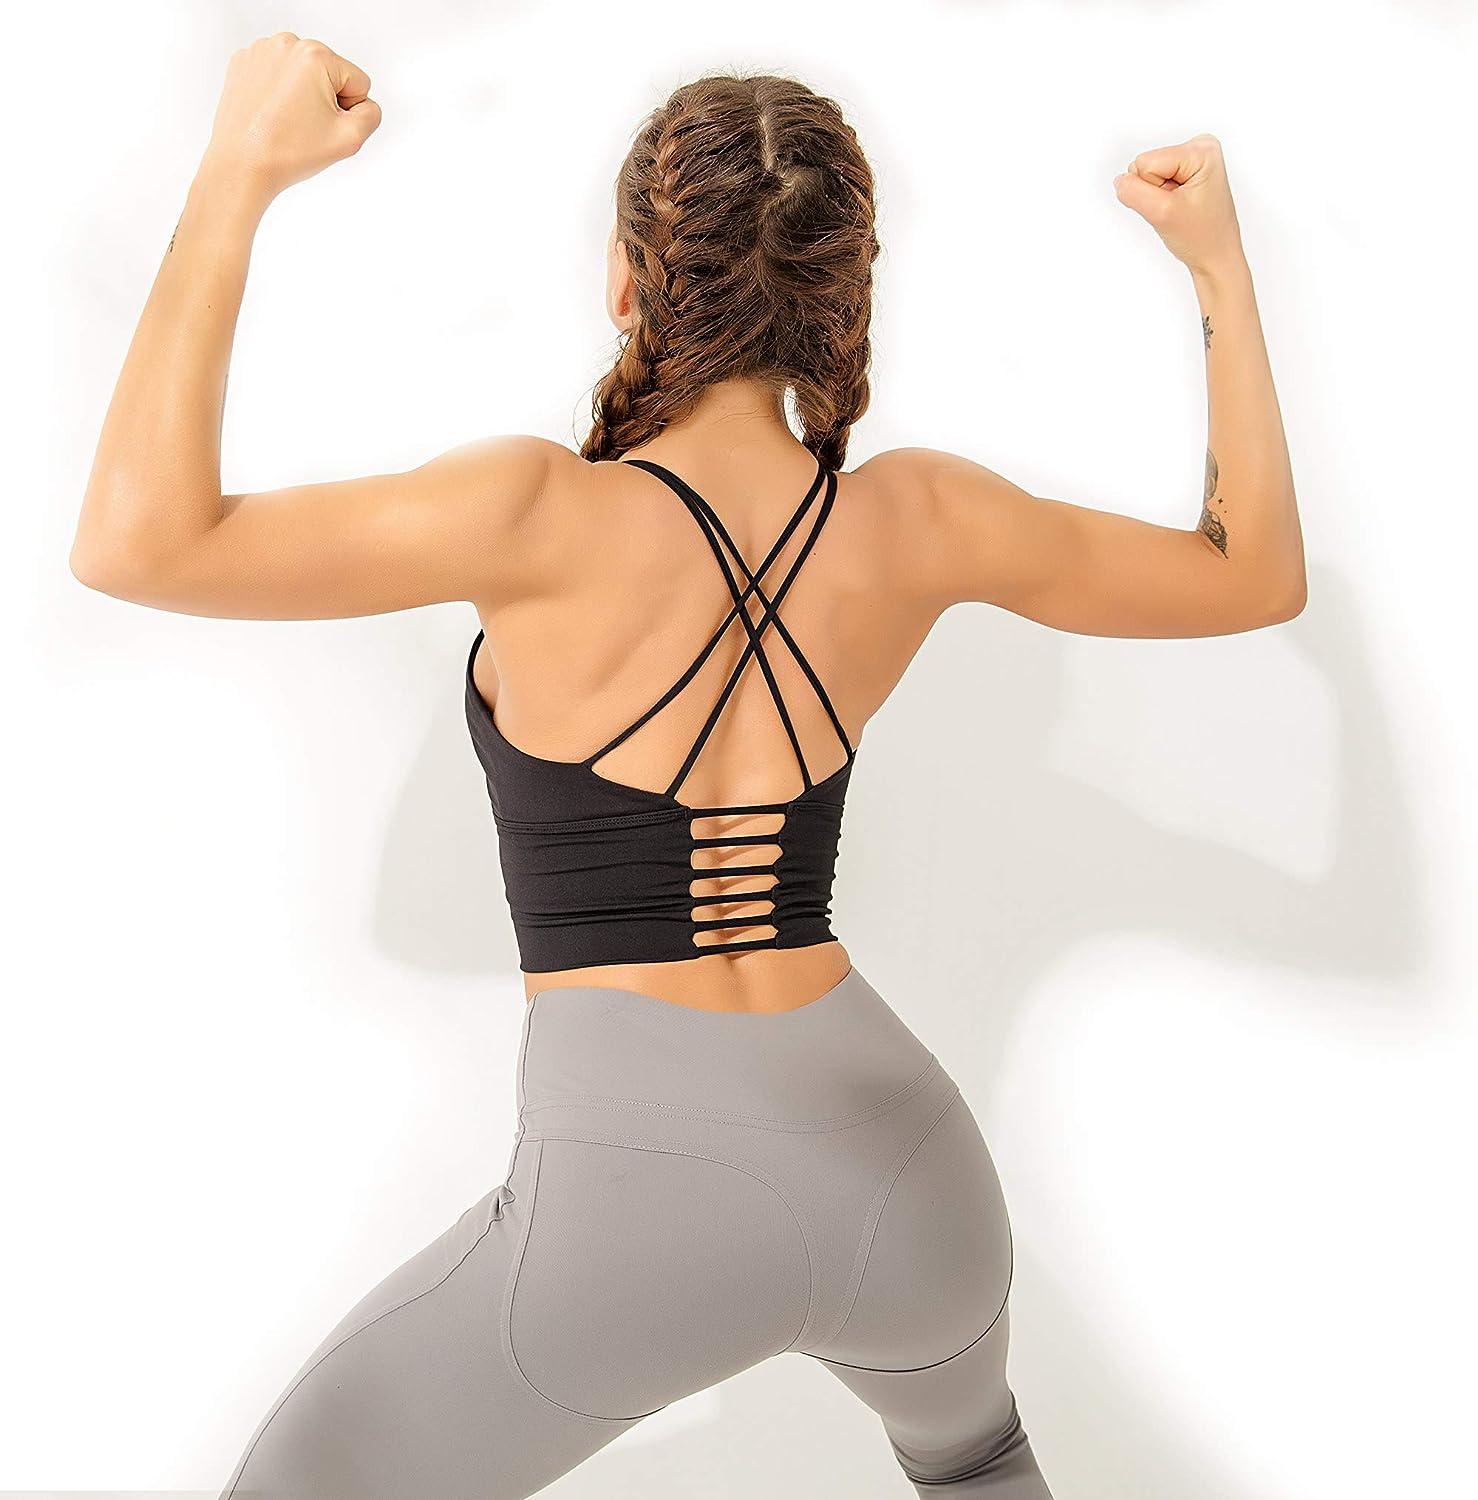 LOFHAS Womens Sports Bras Medium Support Yoga Bras Padded Workout Running Bras